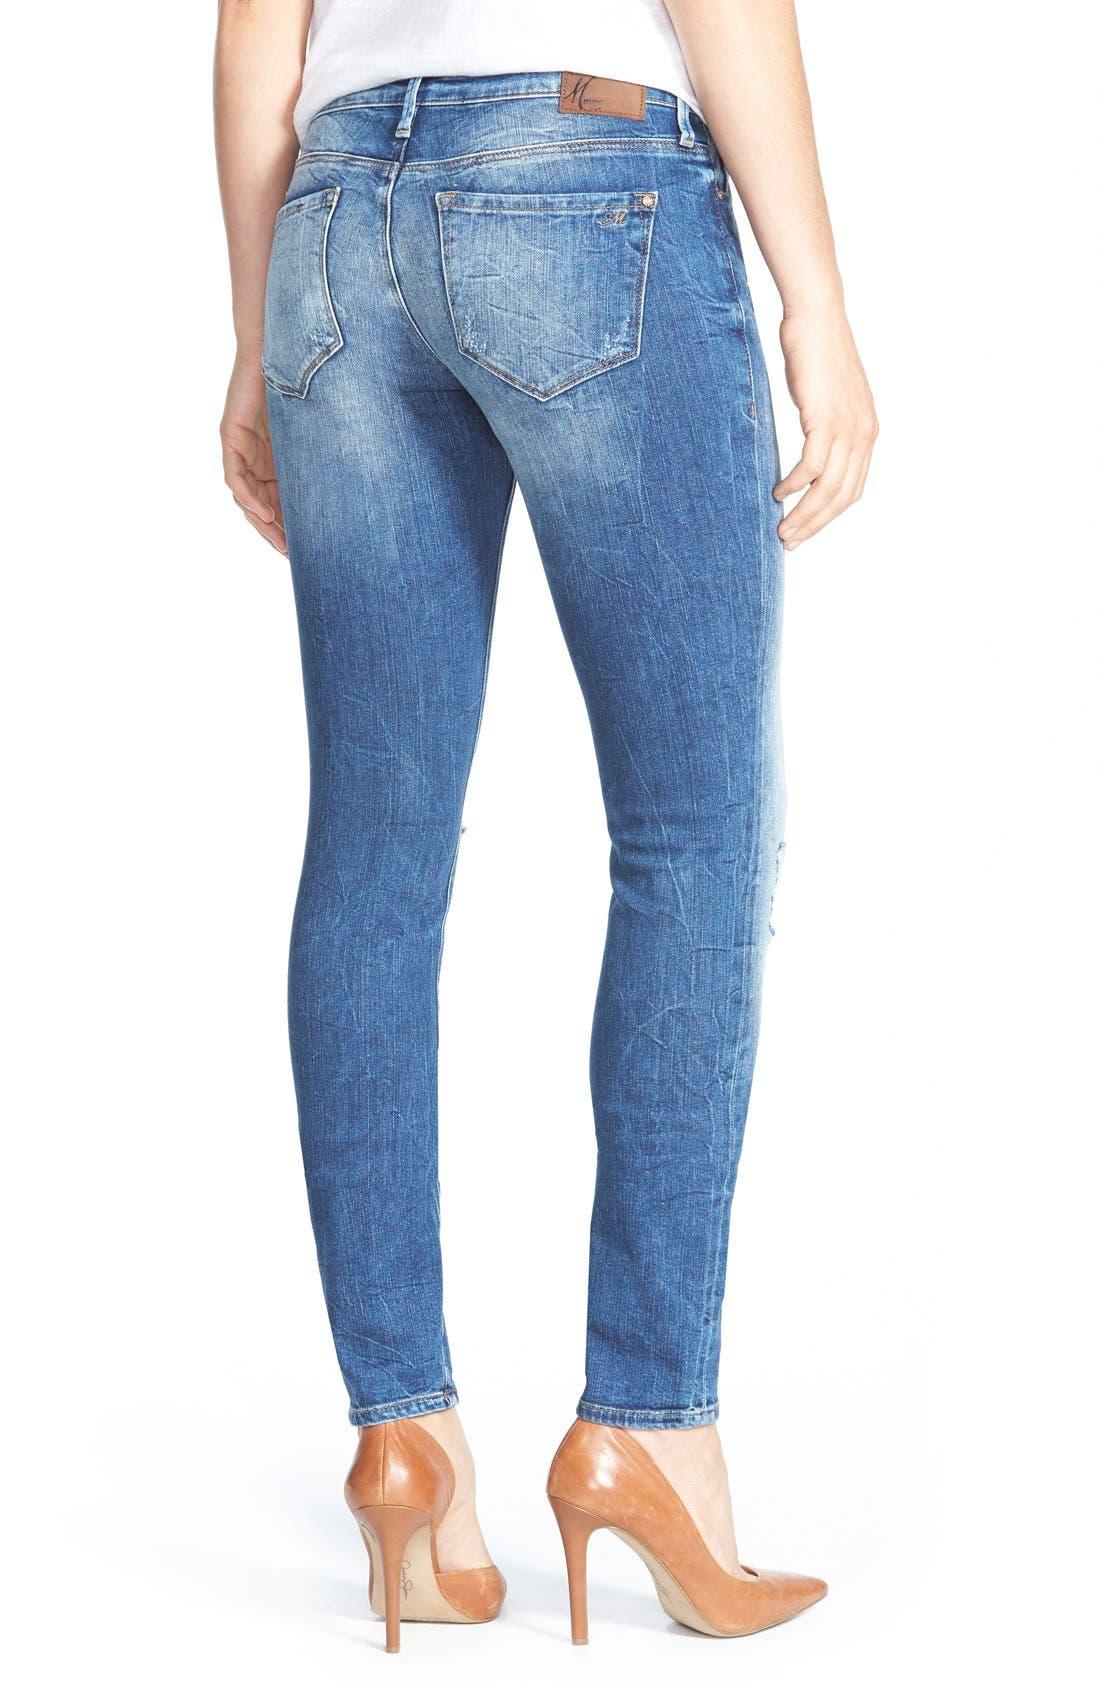 Alternate Image 2  - Mavi Jeans 'Alexa' Distressed Stretch Skinny Jeans (Mid Patched Vintage)